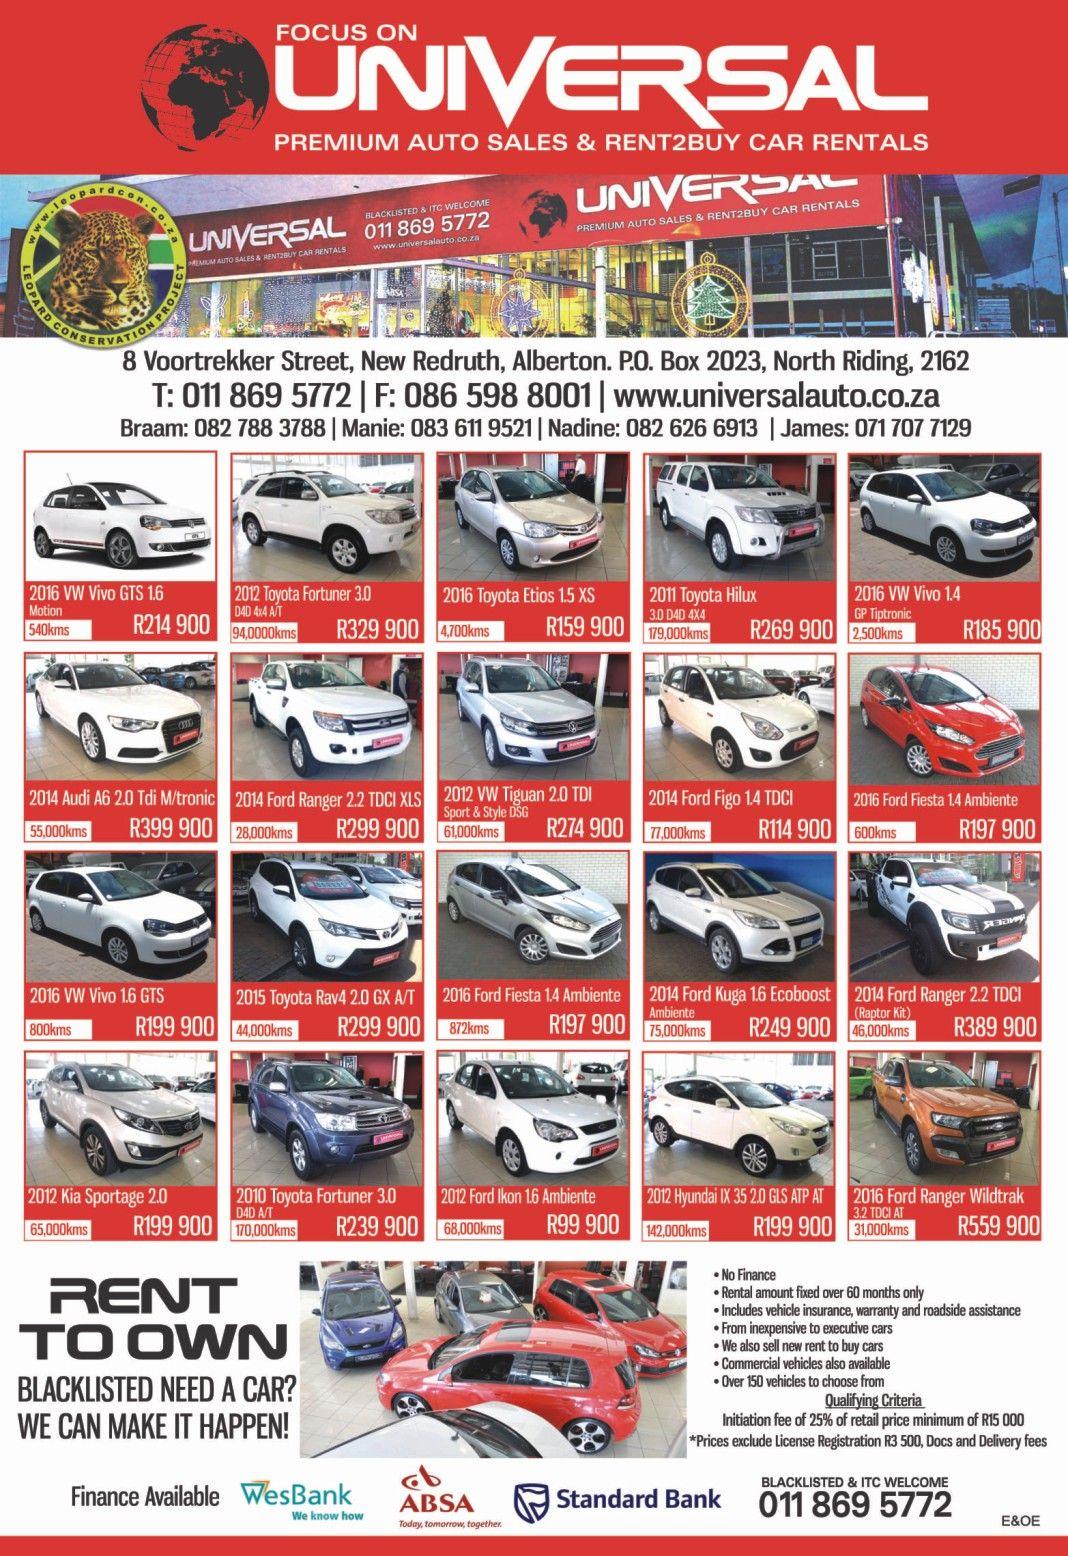 focus on universal premium auto sales rent2buy car rentals rent to own blacklisted. Black Bedroom Furniture Sets. Home Design Ideas